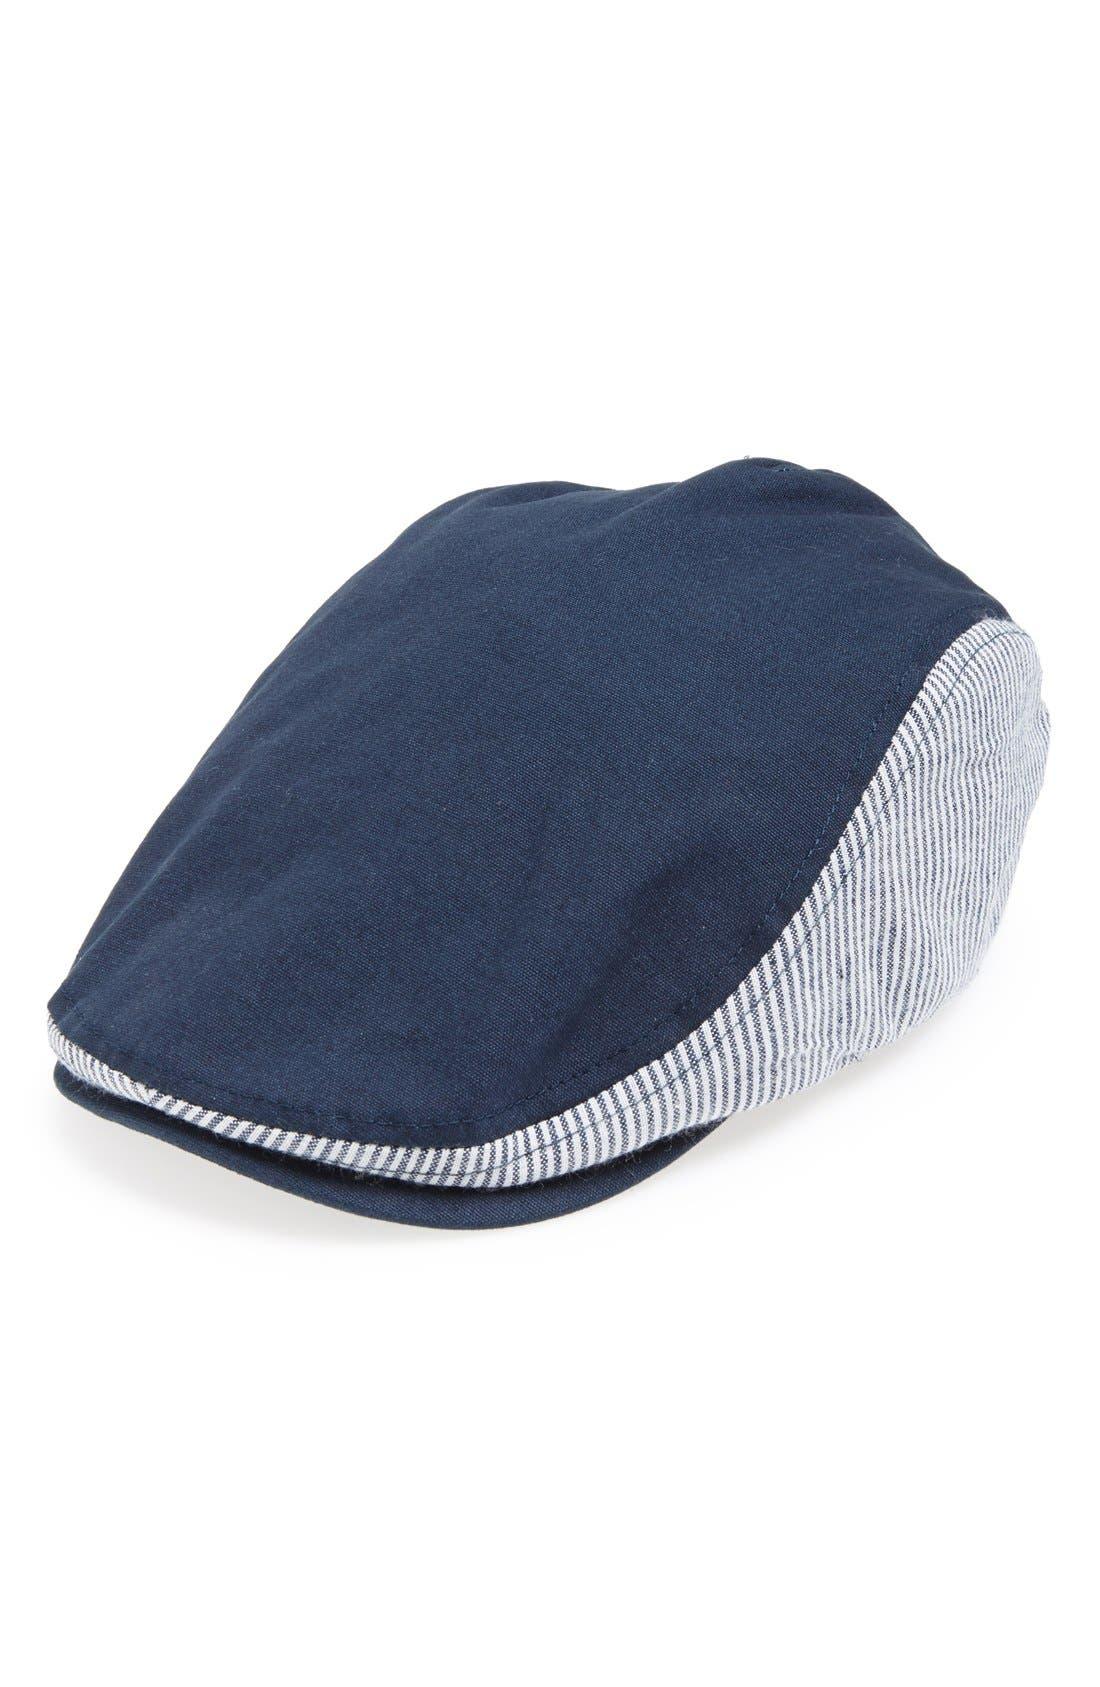 Main Image - Glory Hats by Goorin 'Subzero' Duckbill Driving Cap